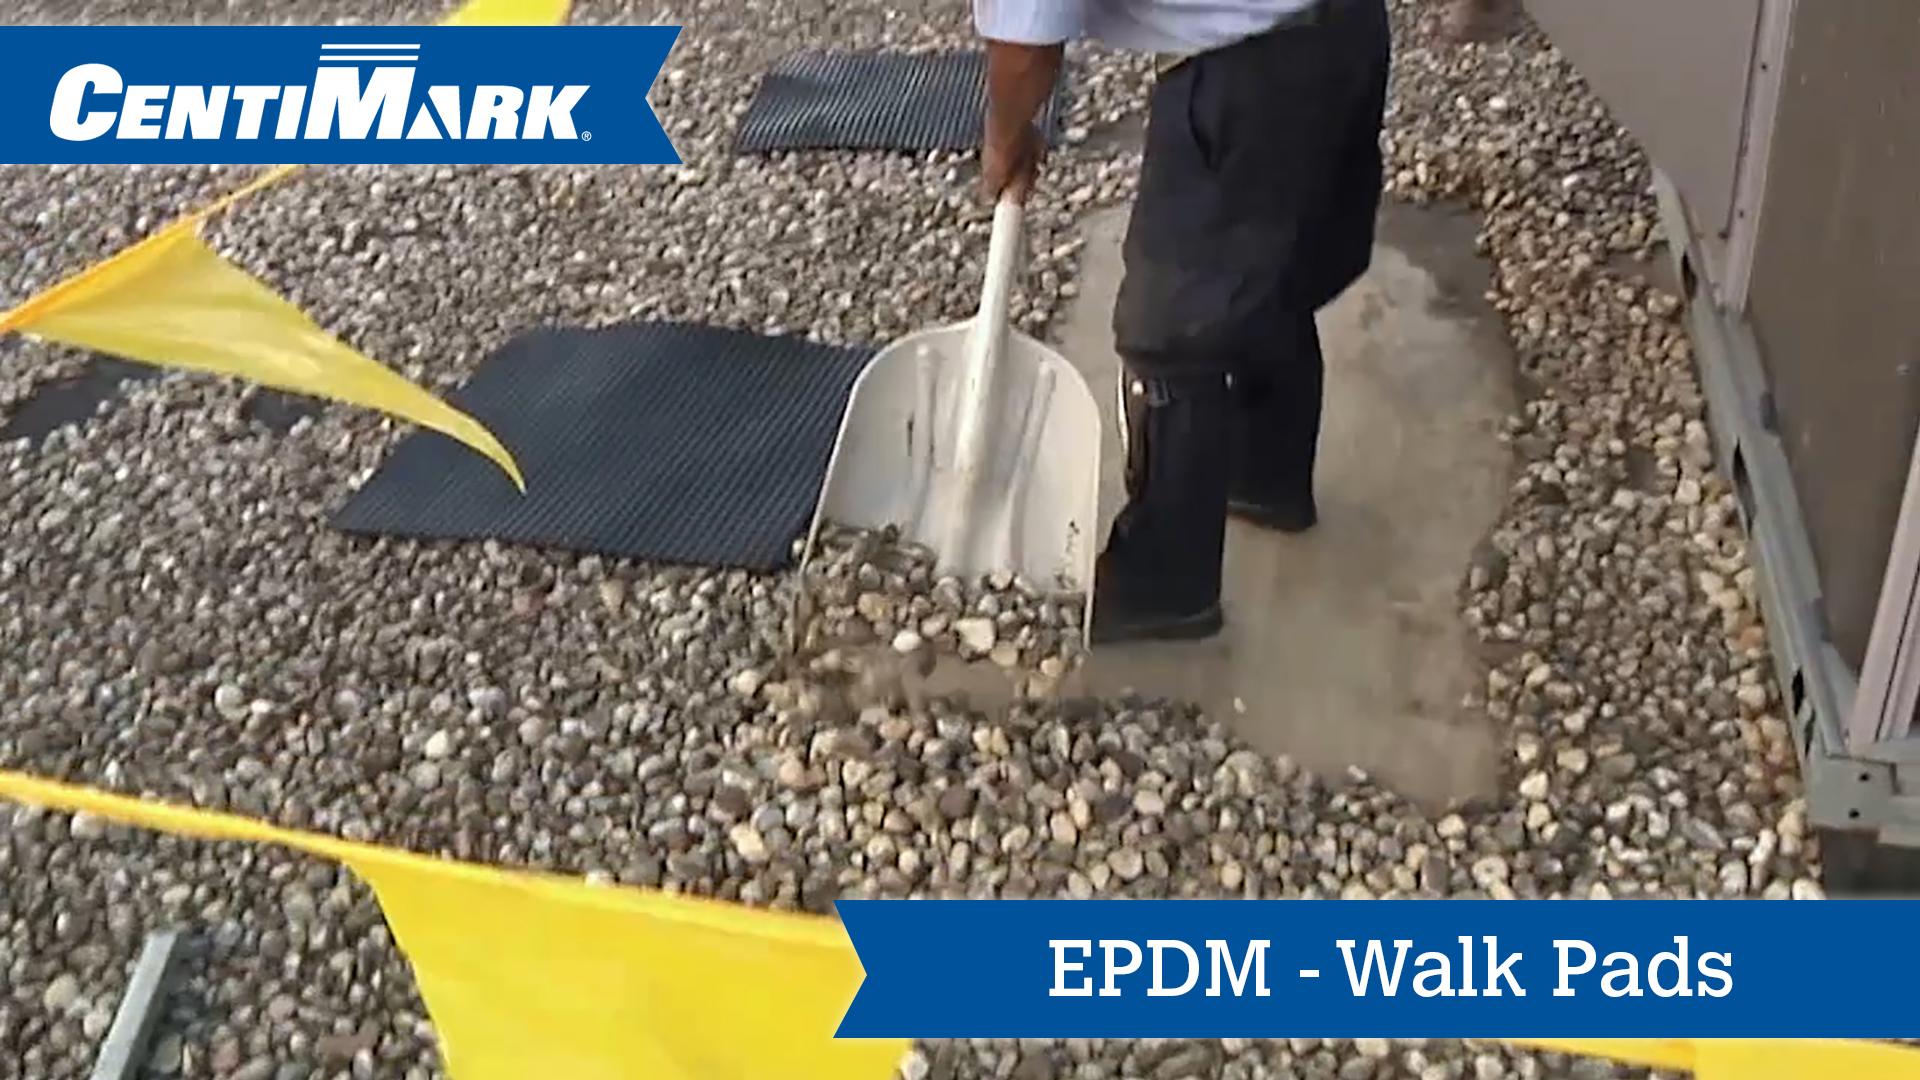 Epdm Roof System Walk Pads Epdm Roofing Centimark